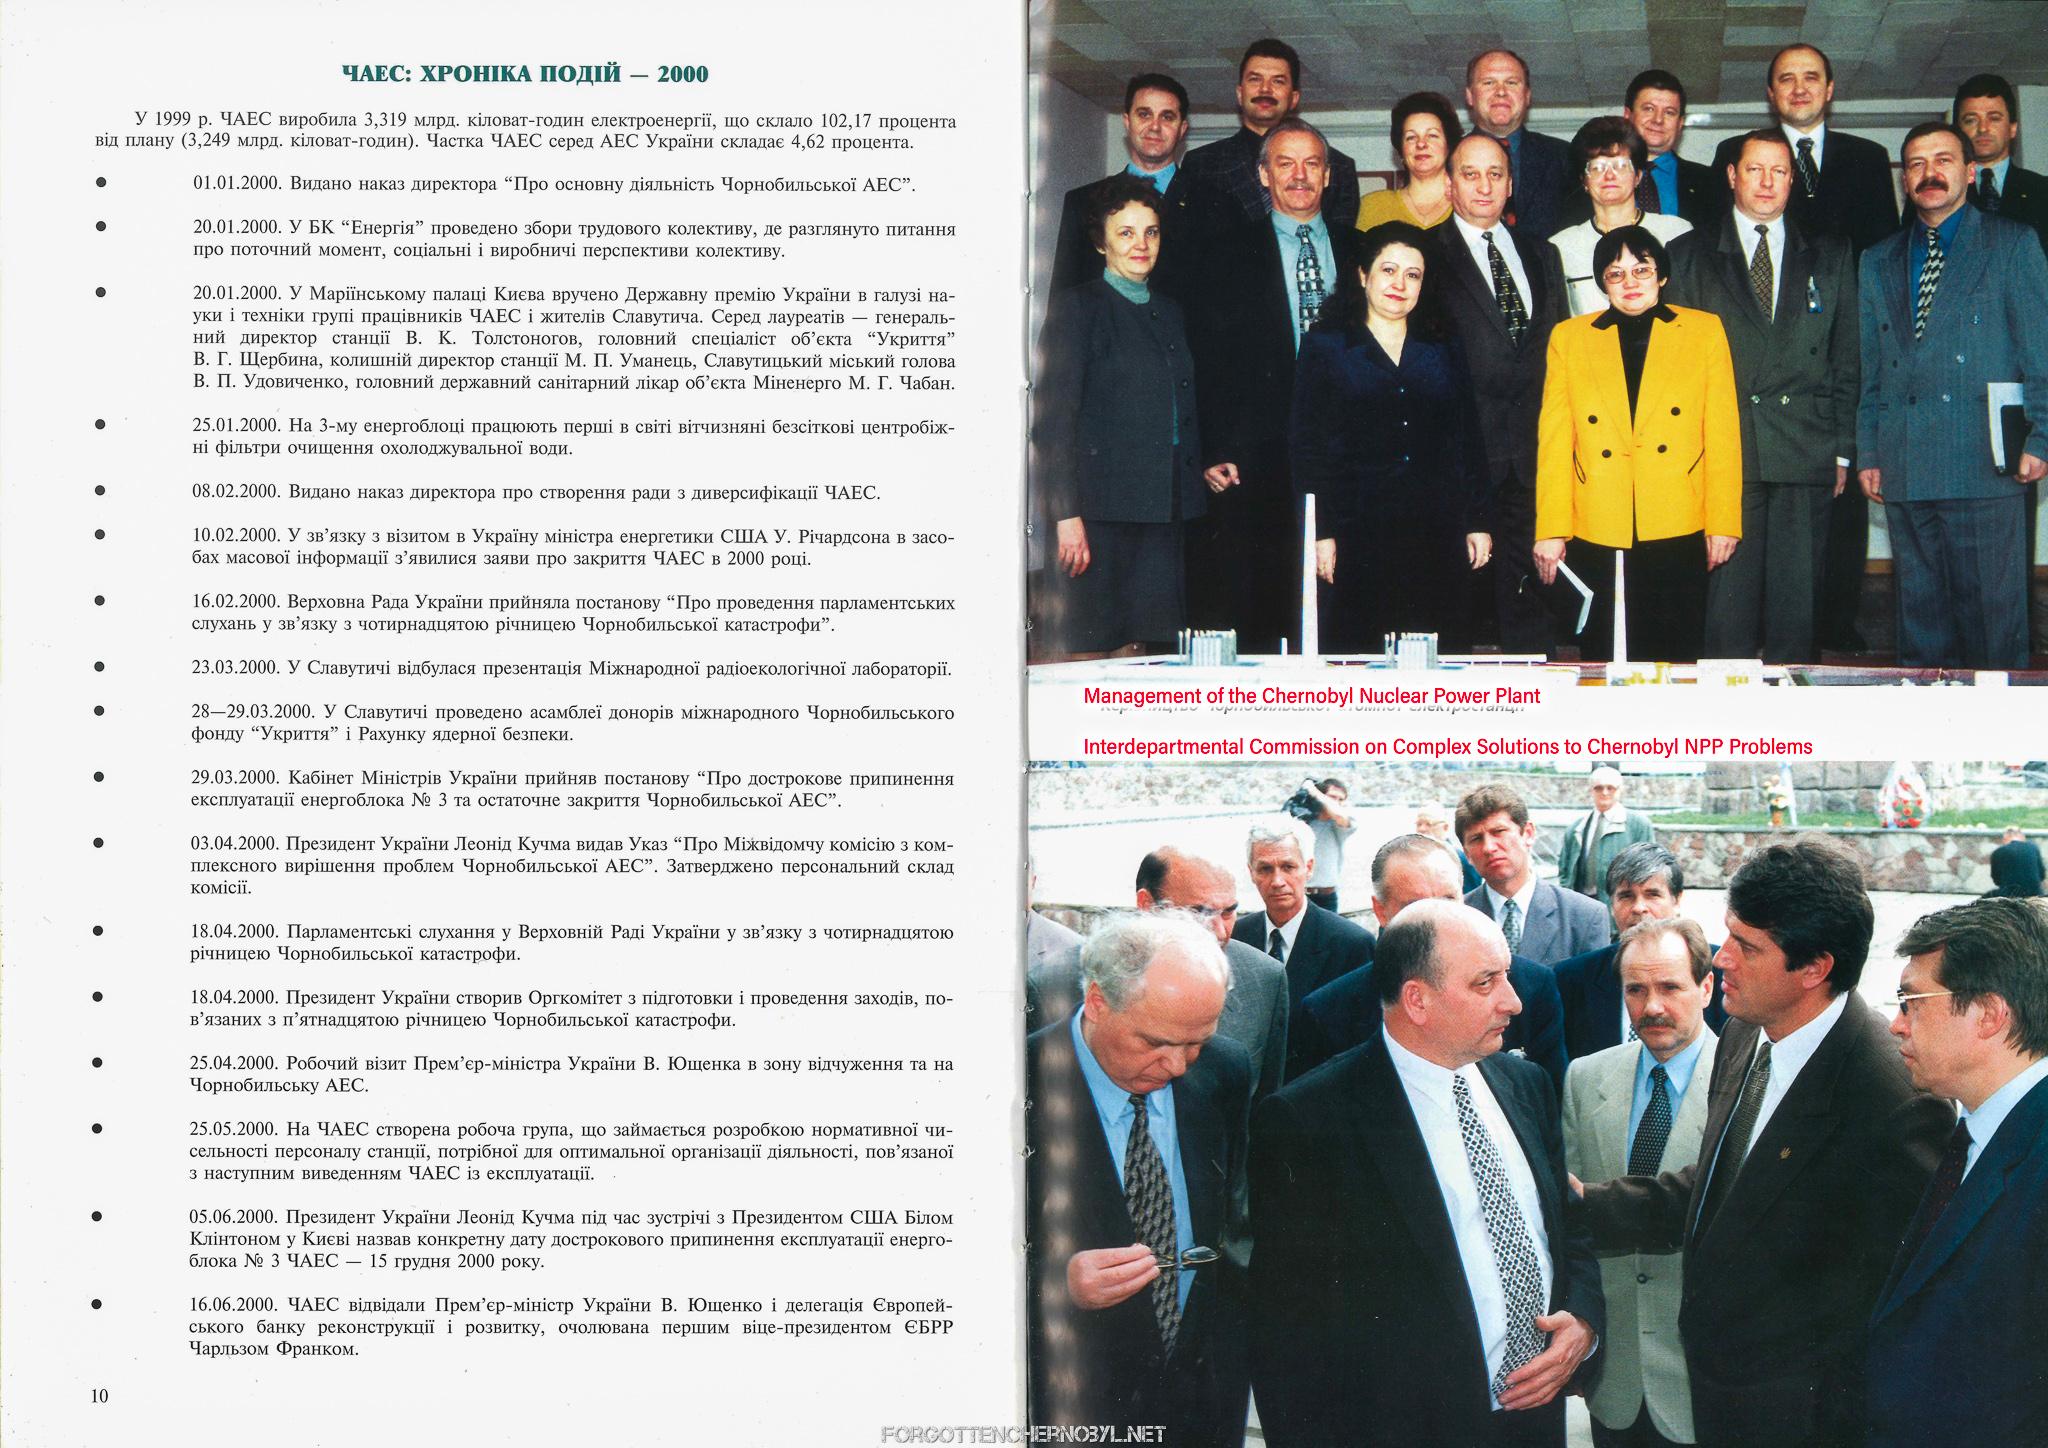 Chernobyl Last Reactor Shutdown Book